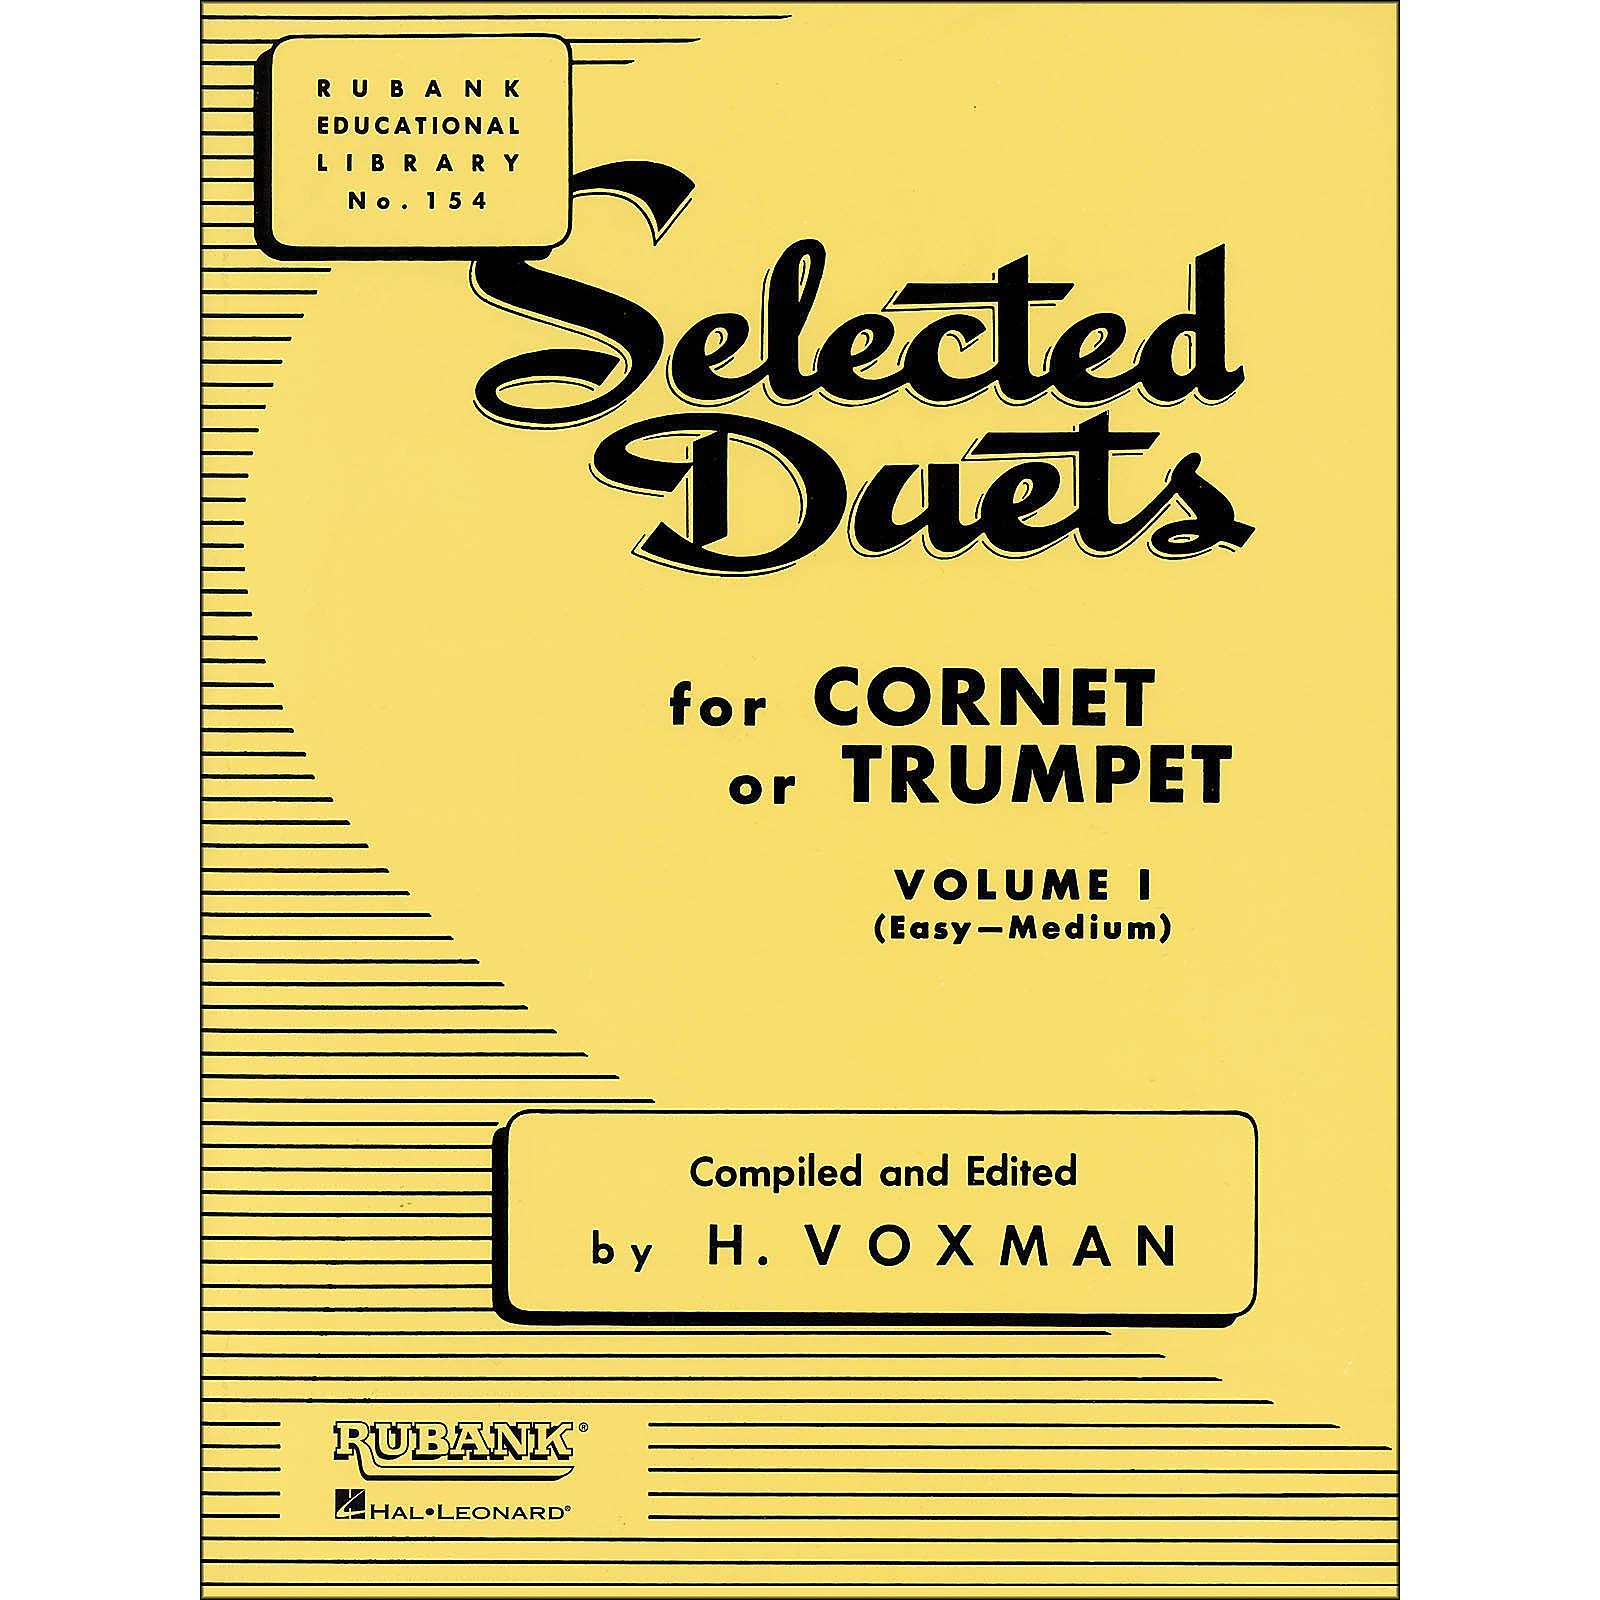 Hal Leonard Rubank Selected Duets for Cornet Or Trumpet Vol 1 Easy/Medium